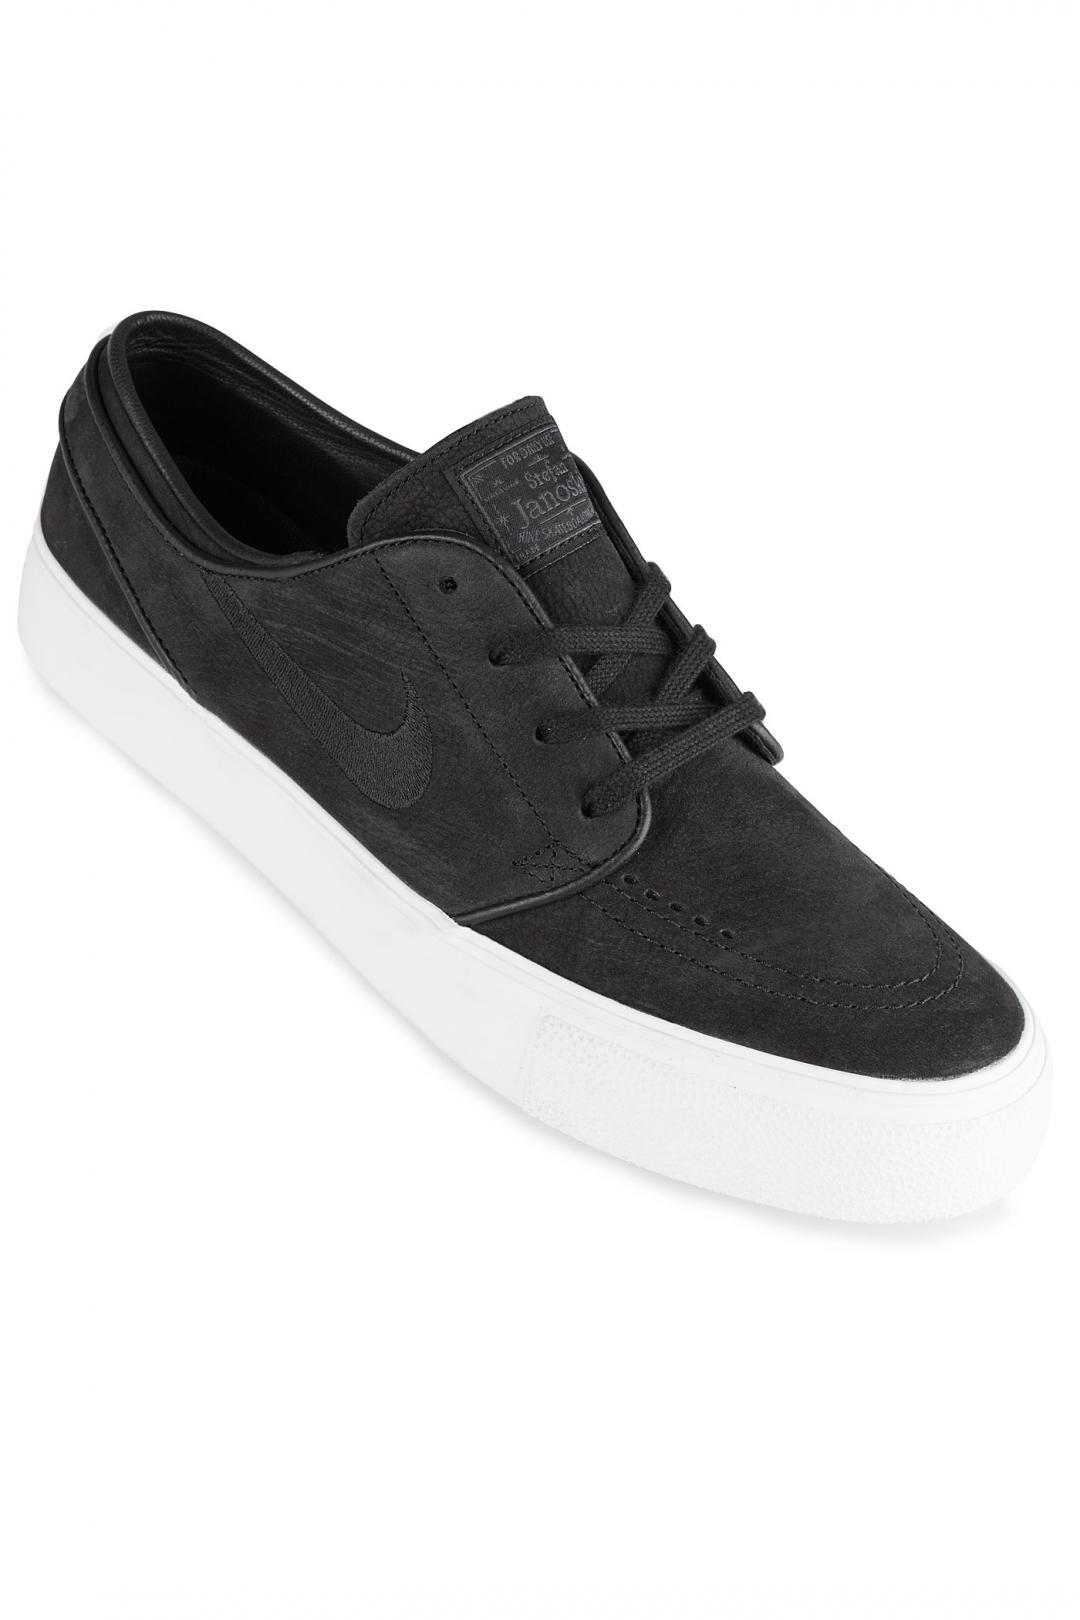 Uomo Nike SB Zoom Stefan Janoski HT black wolf grey   Sneakers low top